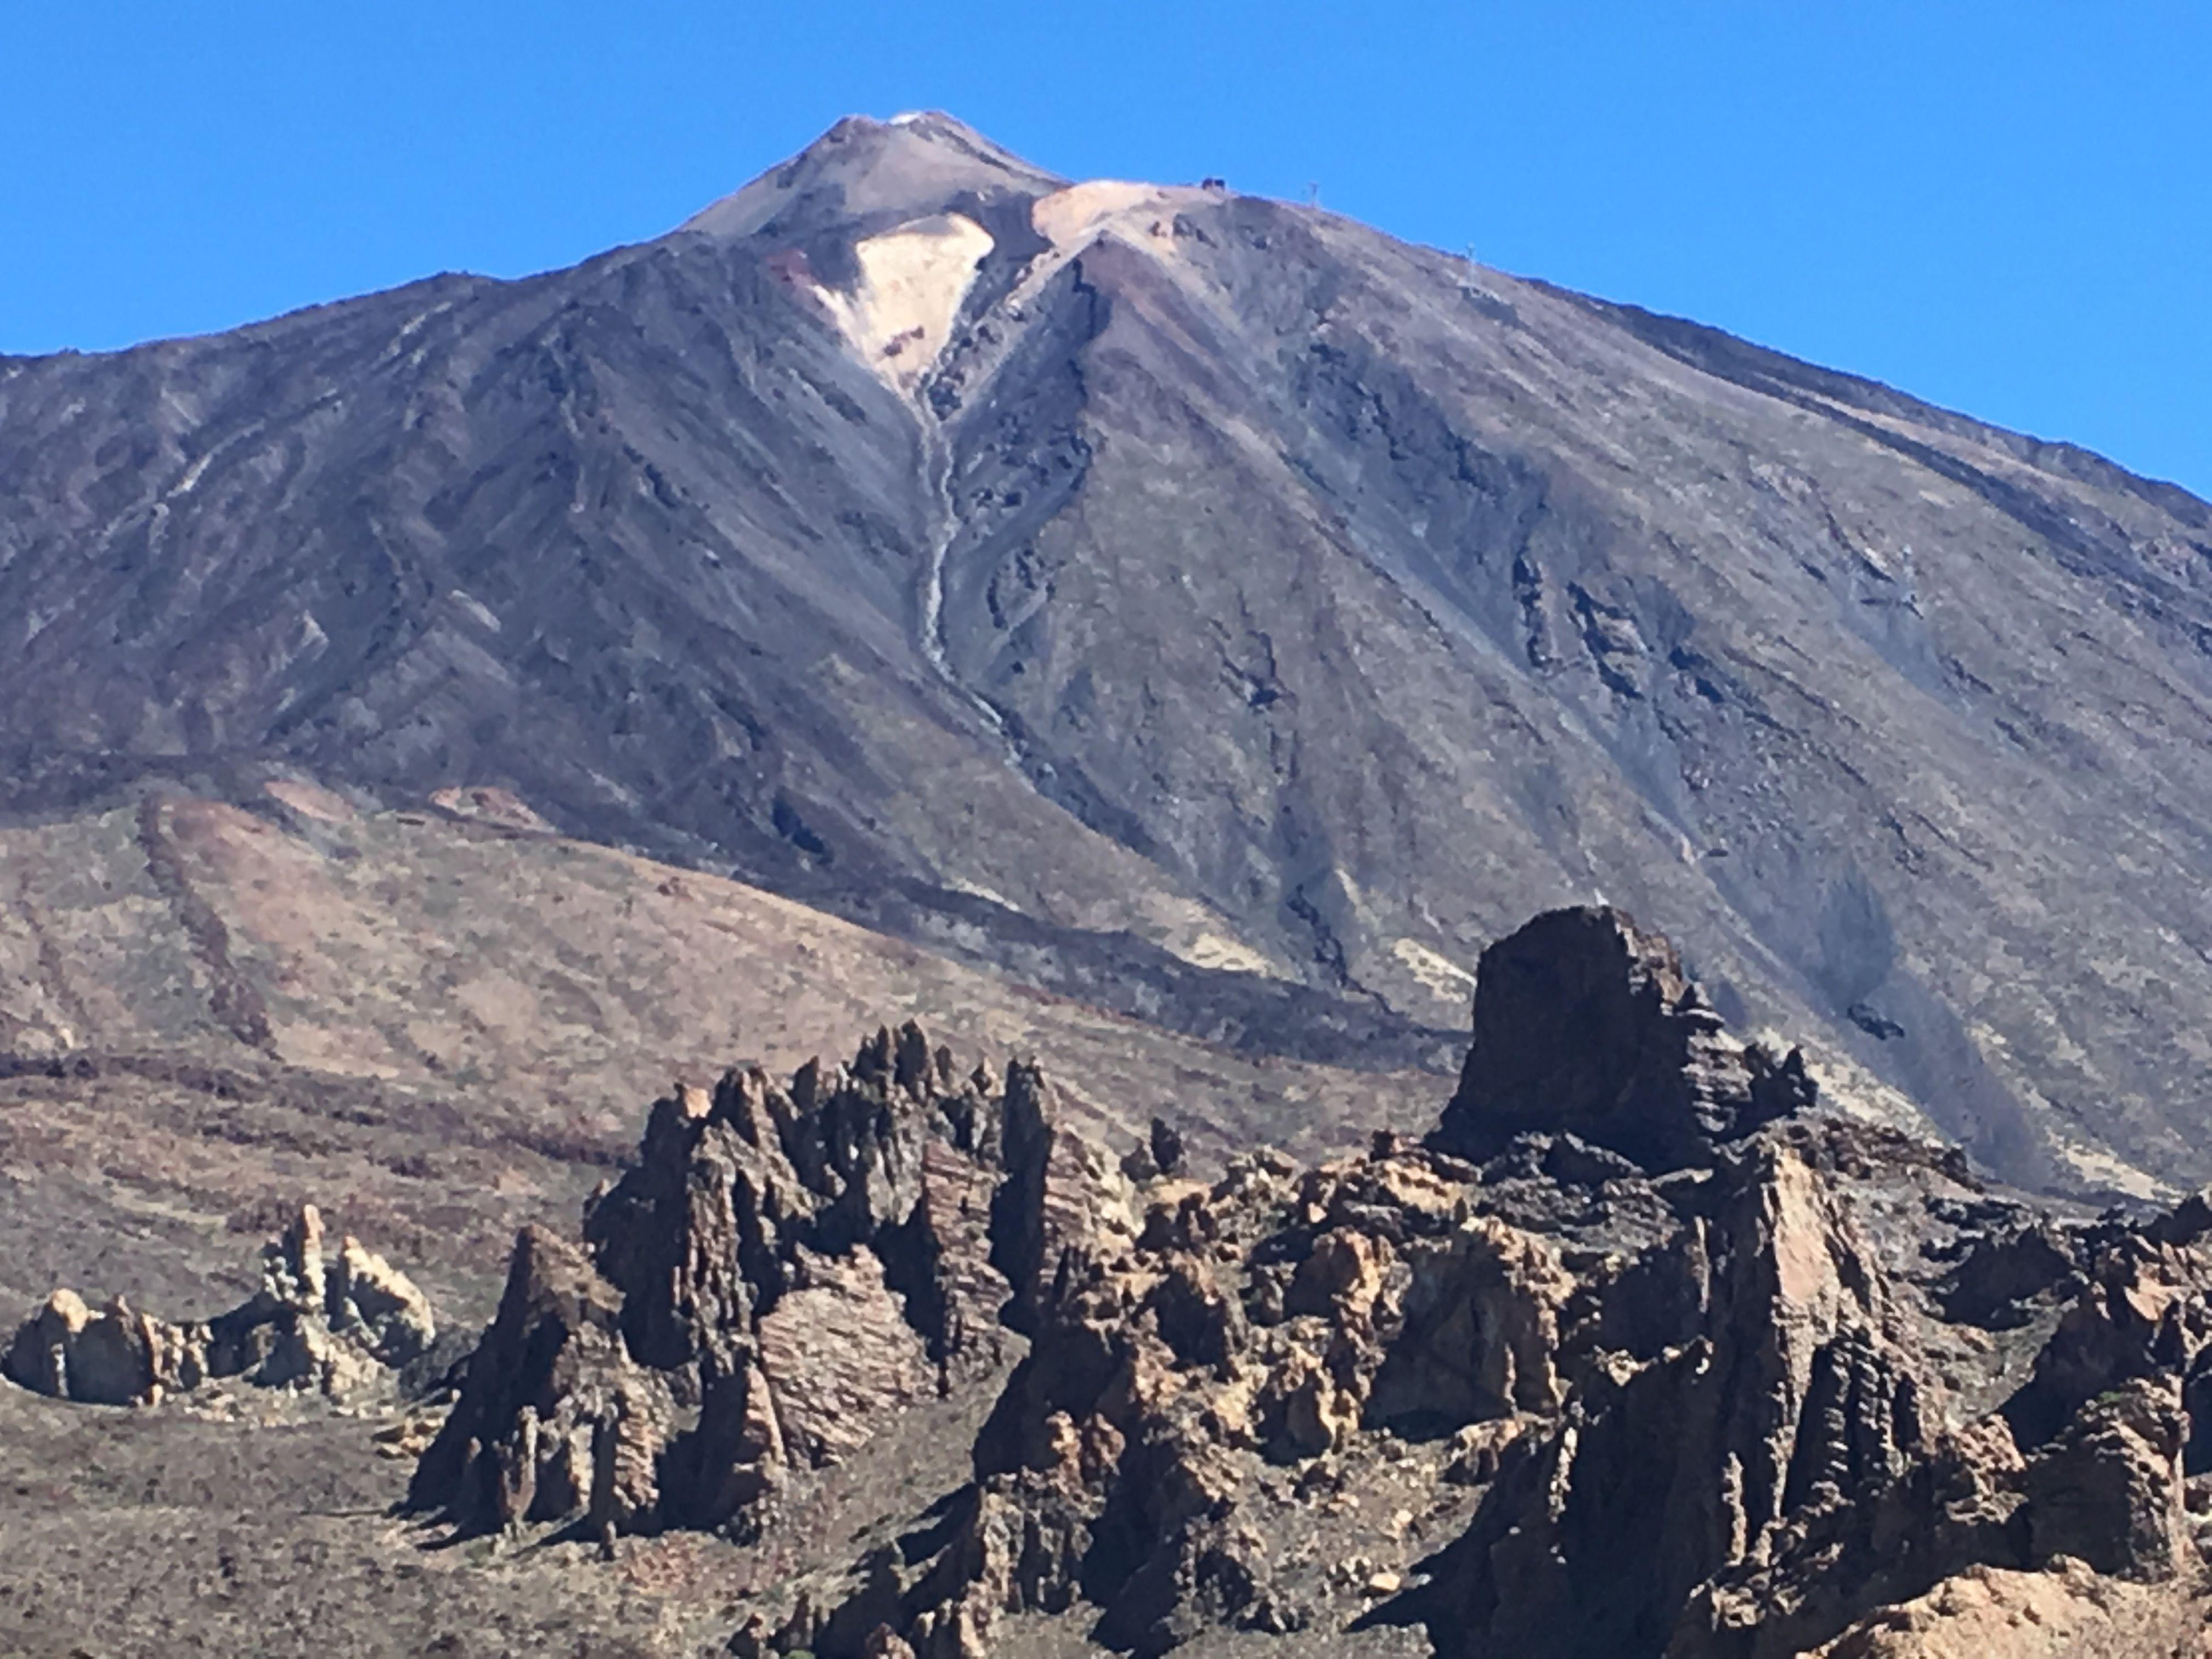 Volcano Teide Tenerife Natural Landmarks Landmarks